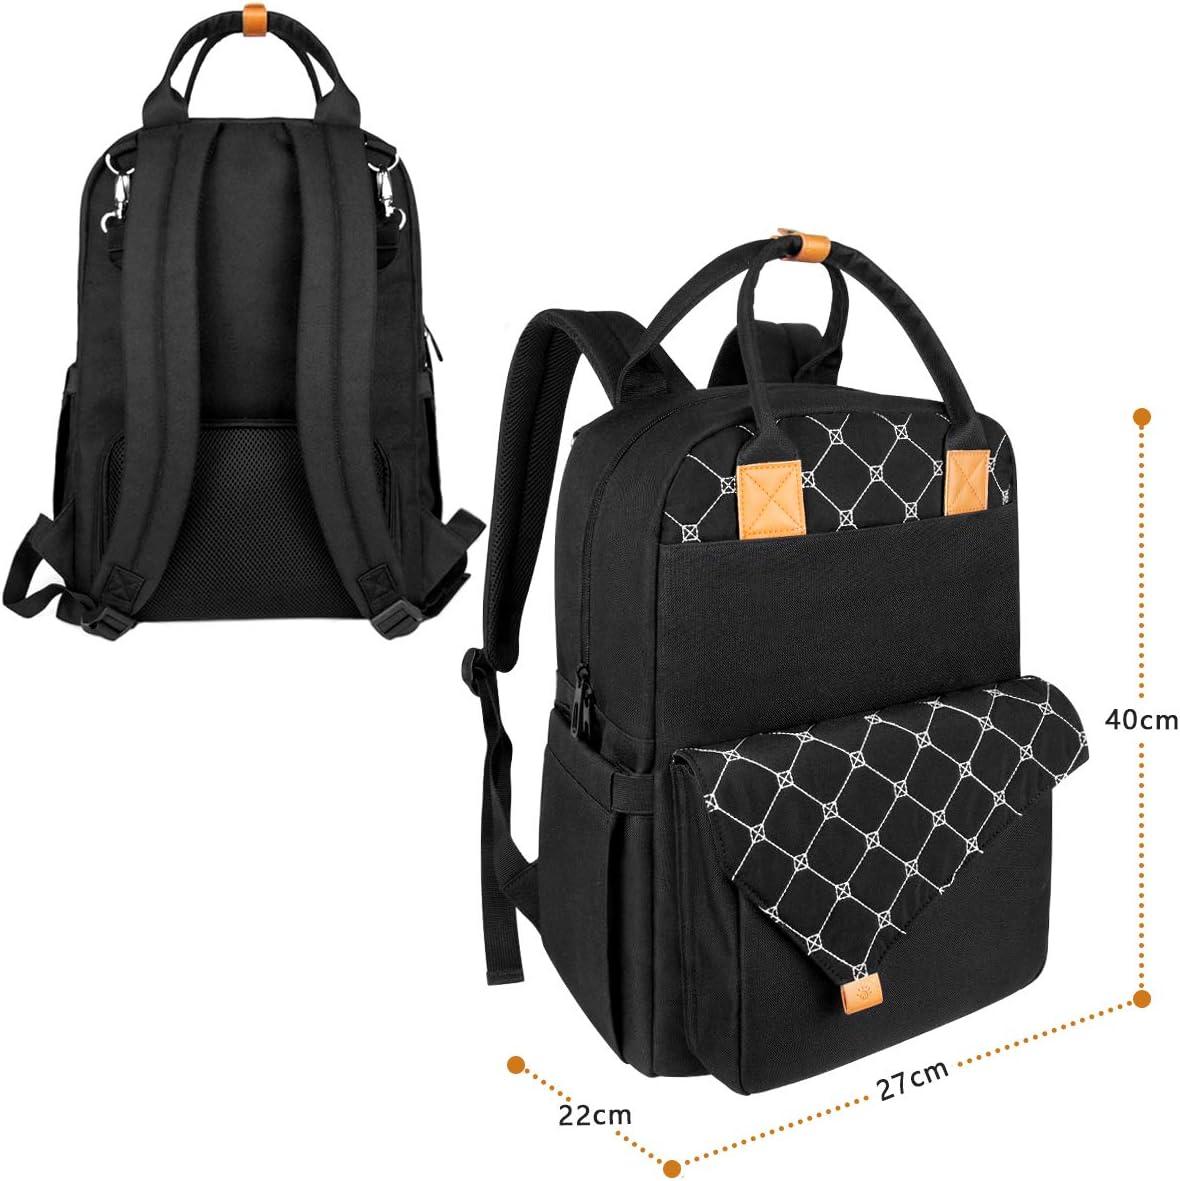 mochila grande para pa/ñales con 3 bolsillos aislados para botellas//correas para cochecitos//cambiador(EU5279griso oscuro) Mochila para cambiar pa/ñales para beb/és